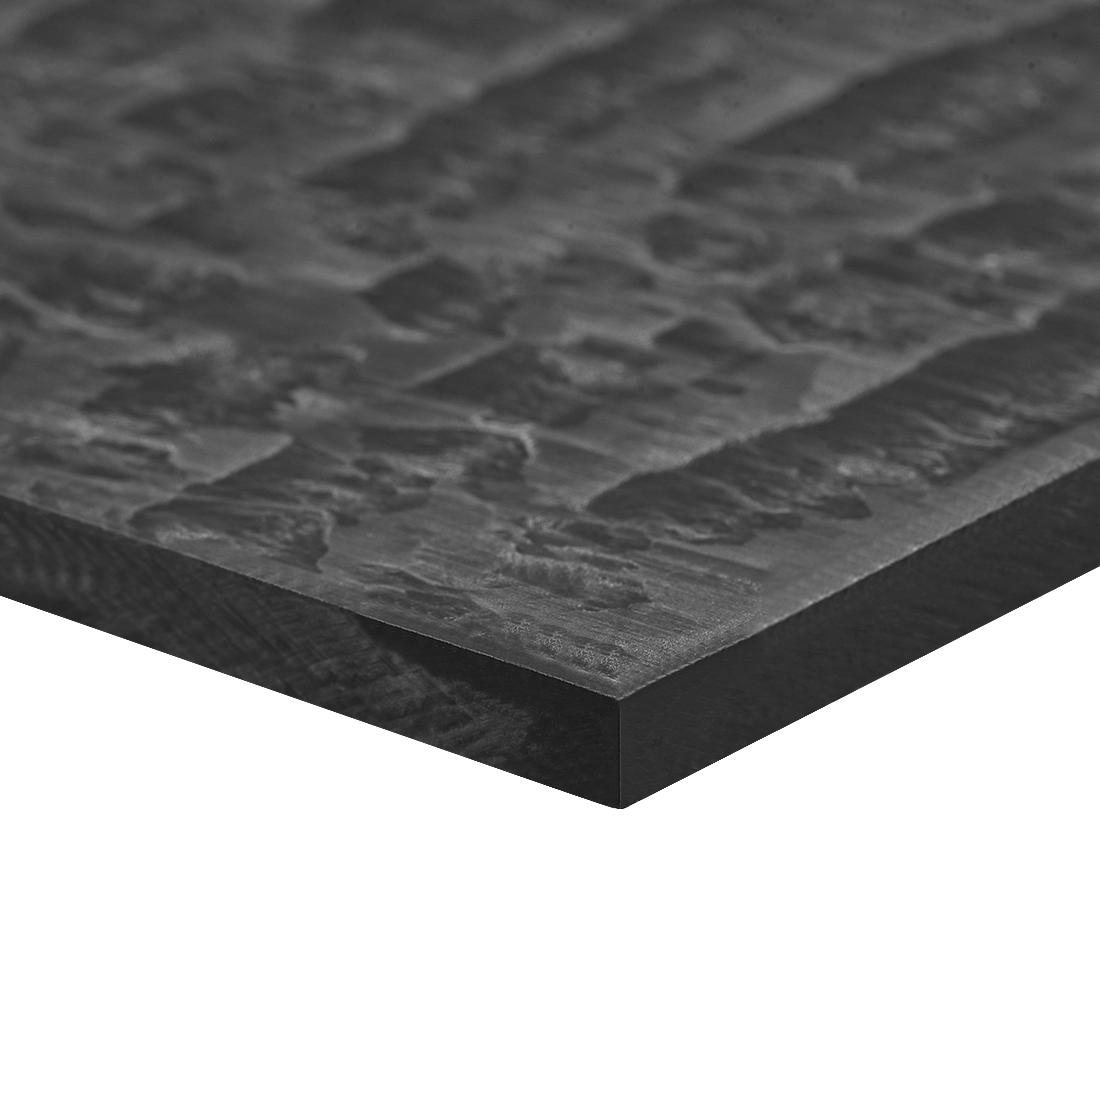 Acetal POM Sheet Polyoxymethylene Plate Sheet 100 x 150 x 5mm Black 4 Pcs